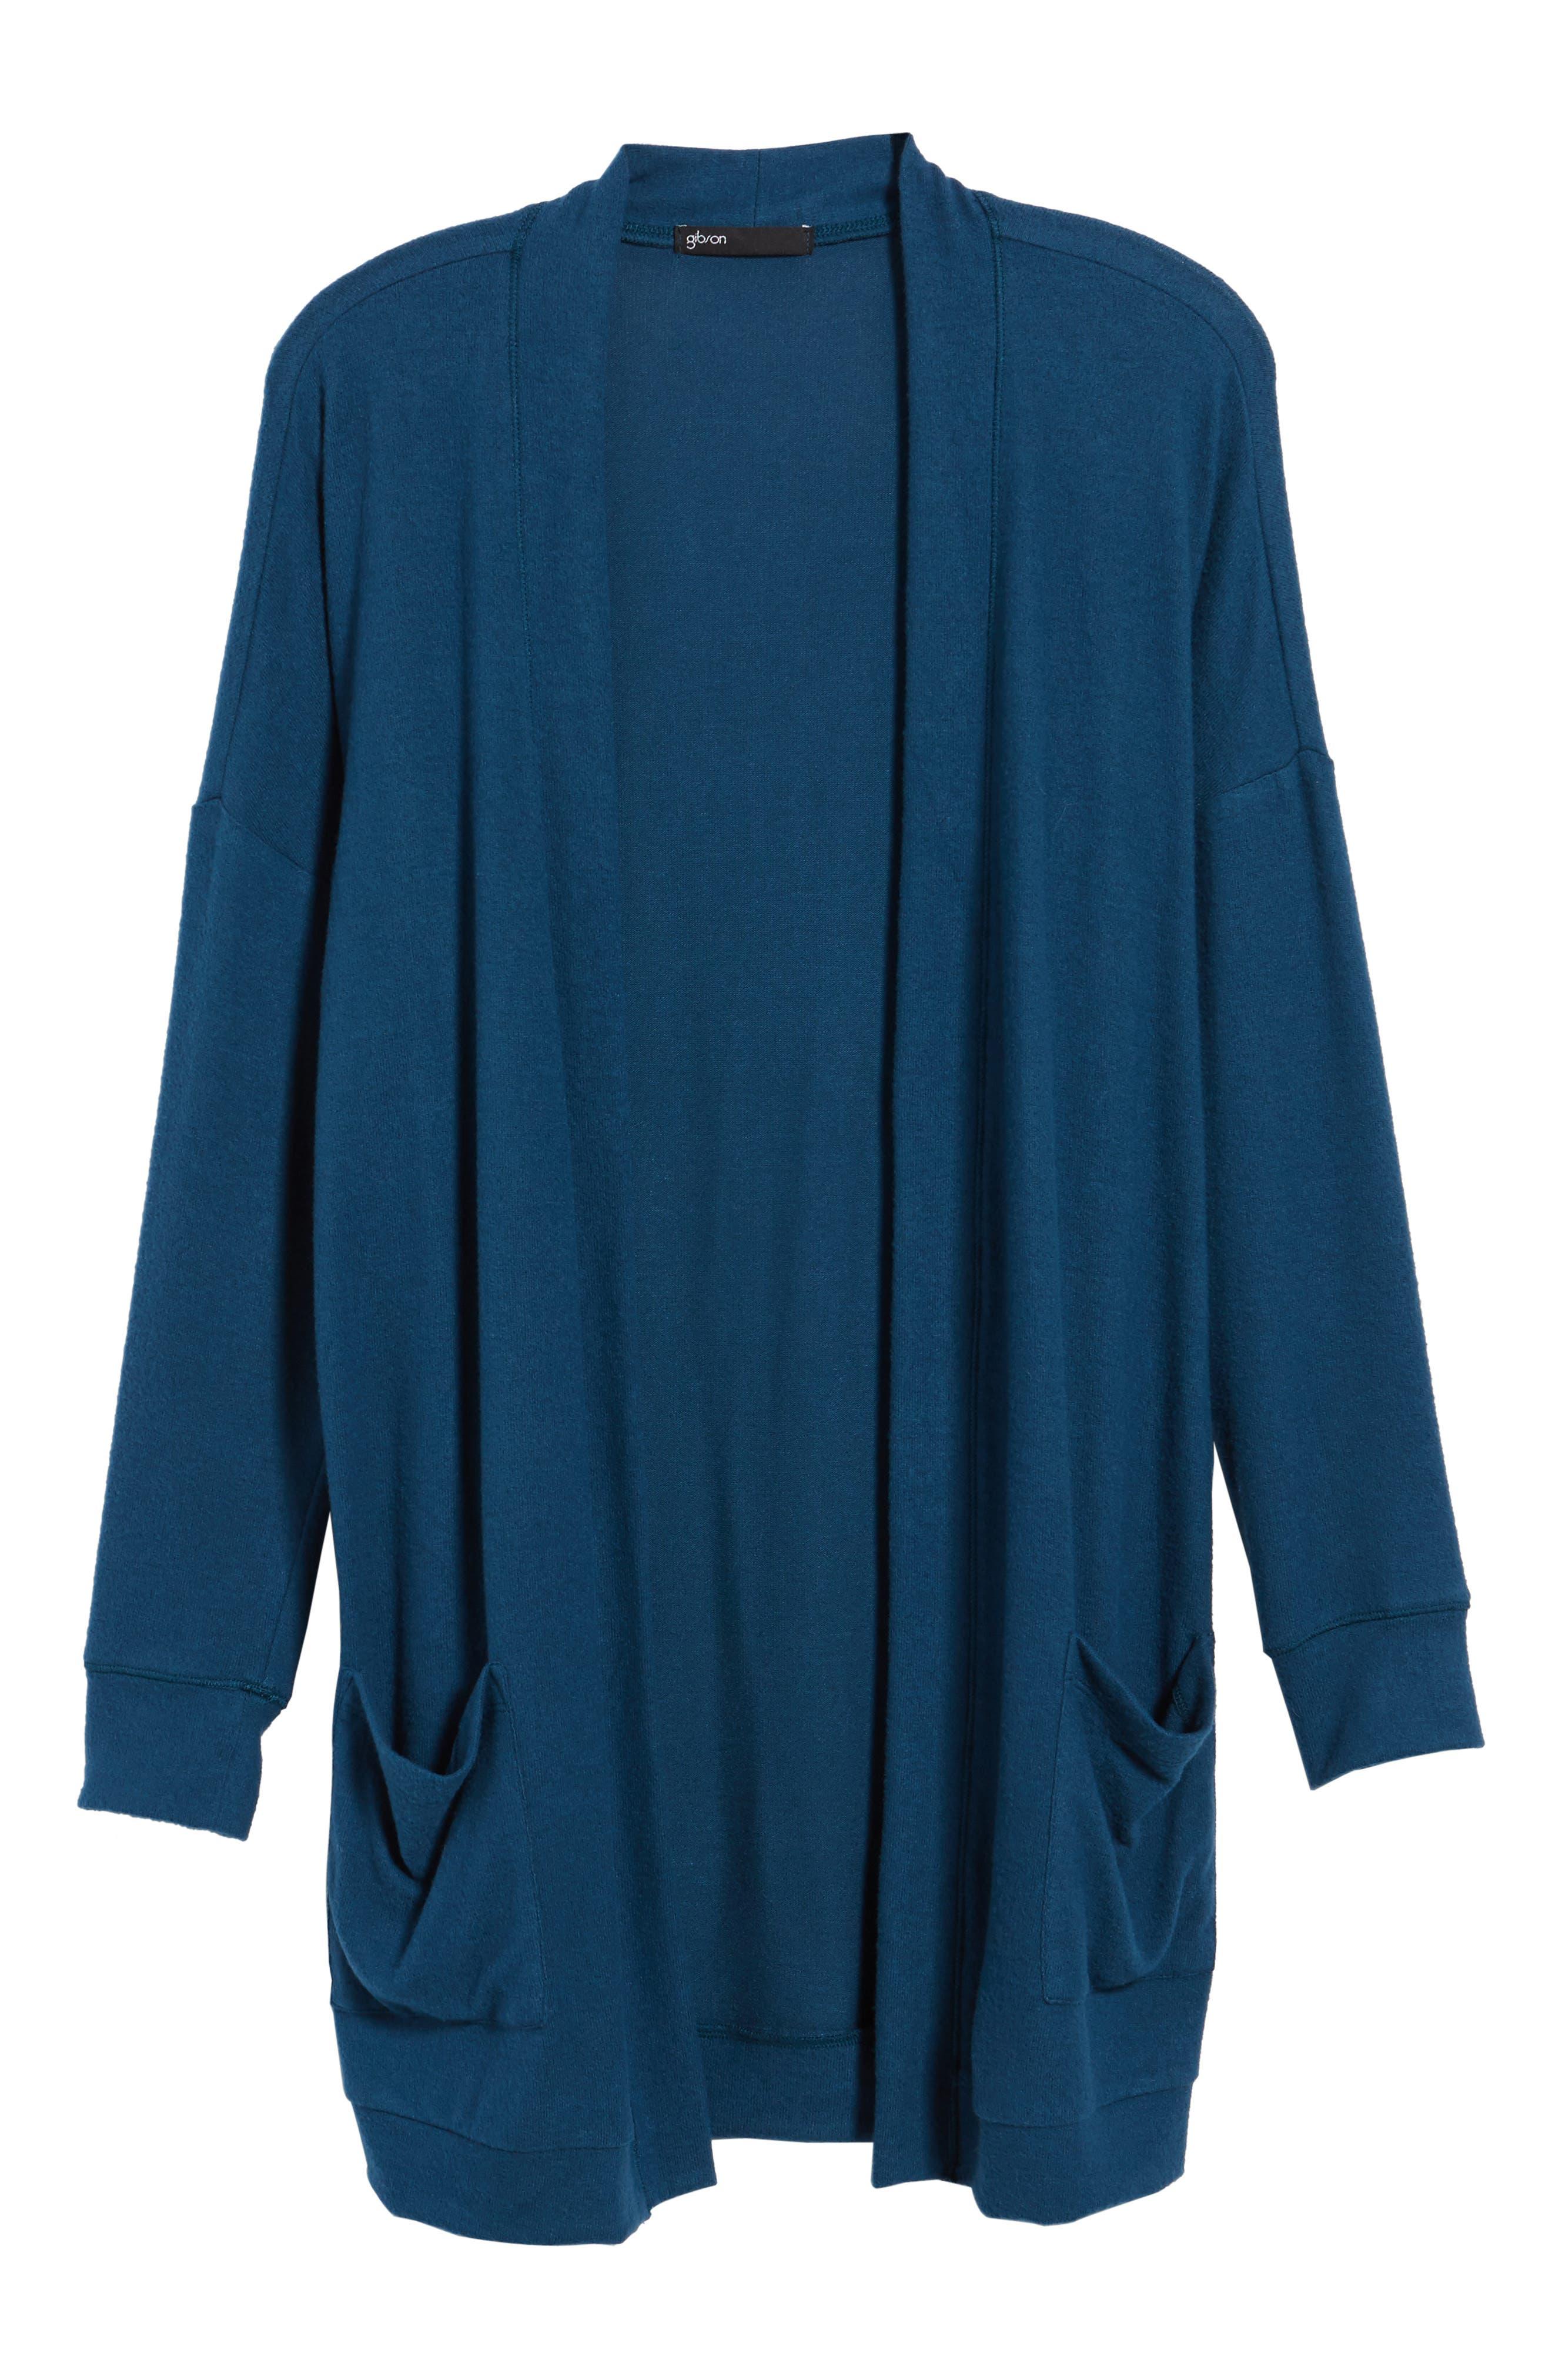 GIBSON, Rib Knit Cardigan, Alternate thumbnail 6, color, BLUE CERAMIC